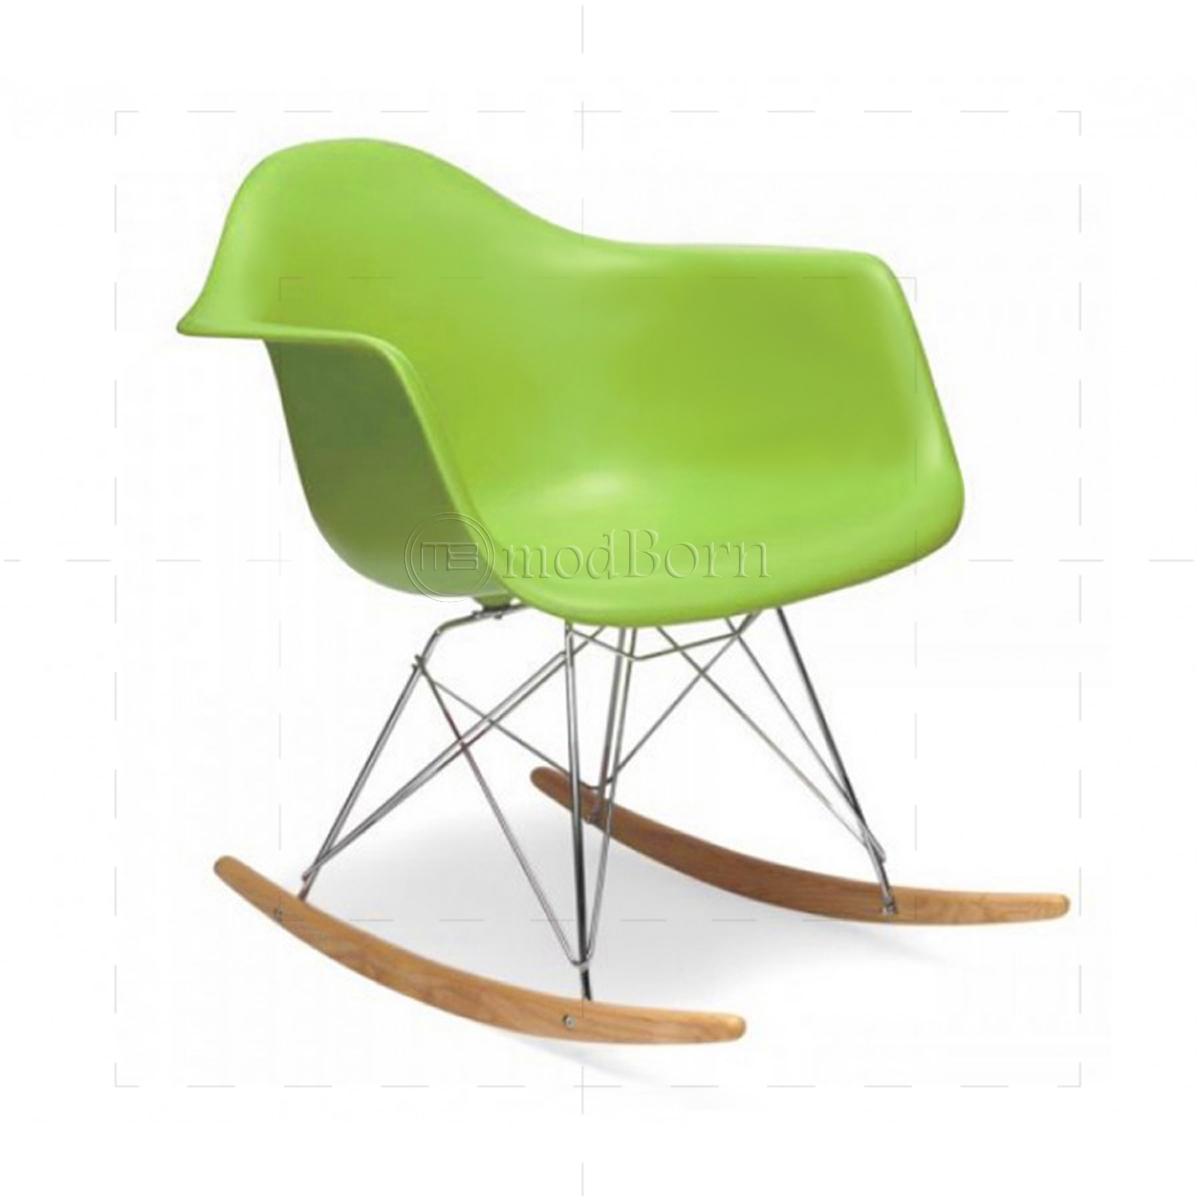 Eames Style Dining Rocking RAR Arm Chair Green : Eames CEDC RAR GREEN 1200x1200 from www.modborn.com size 1200 x 1200 jpeg 334kB